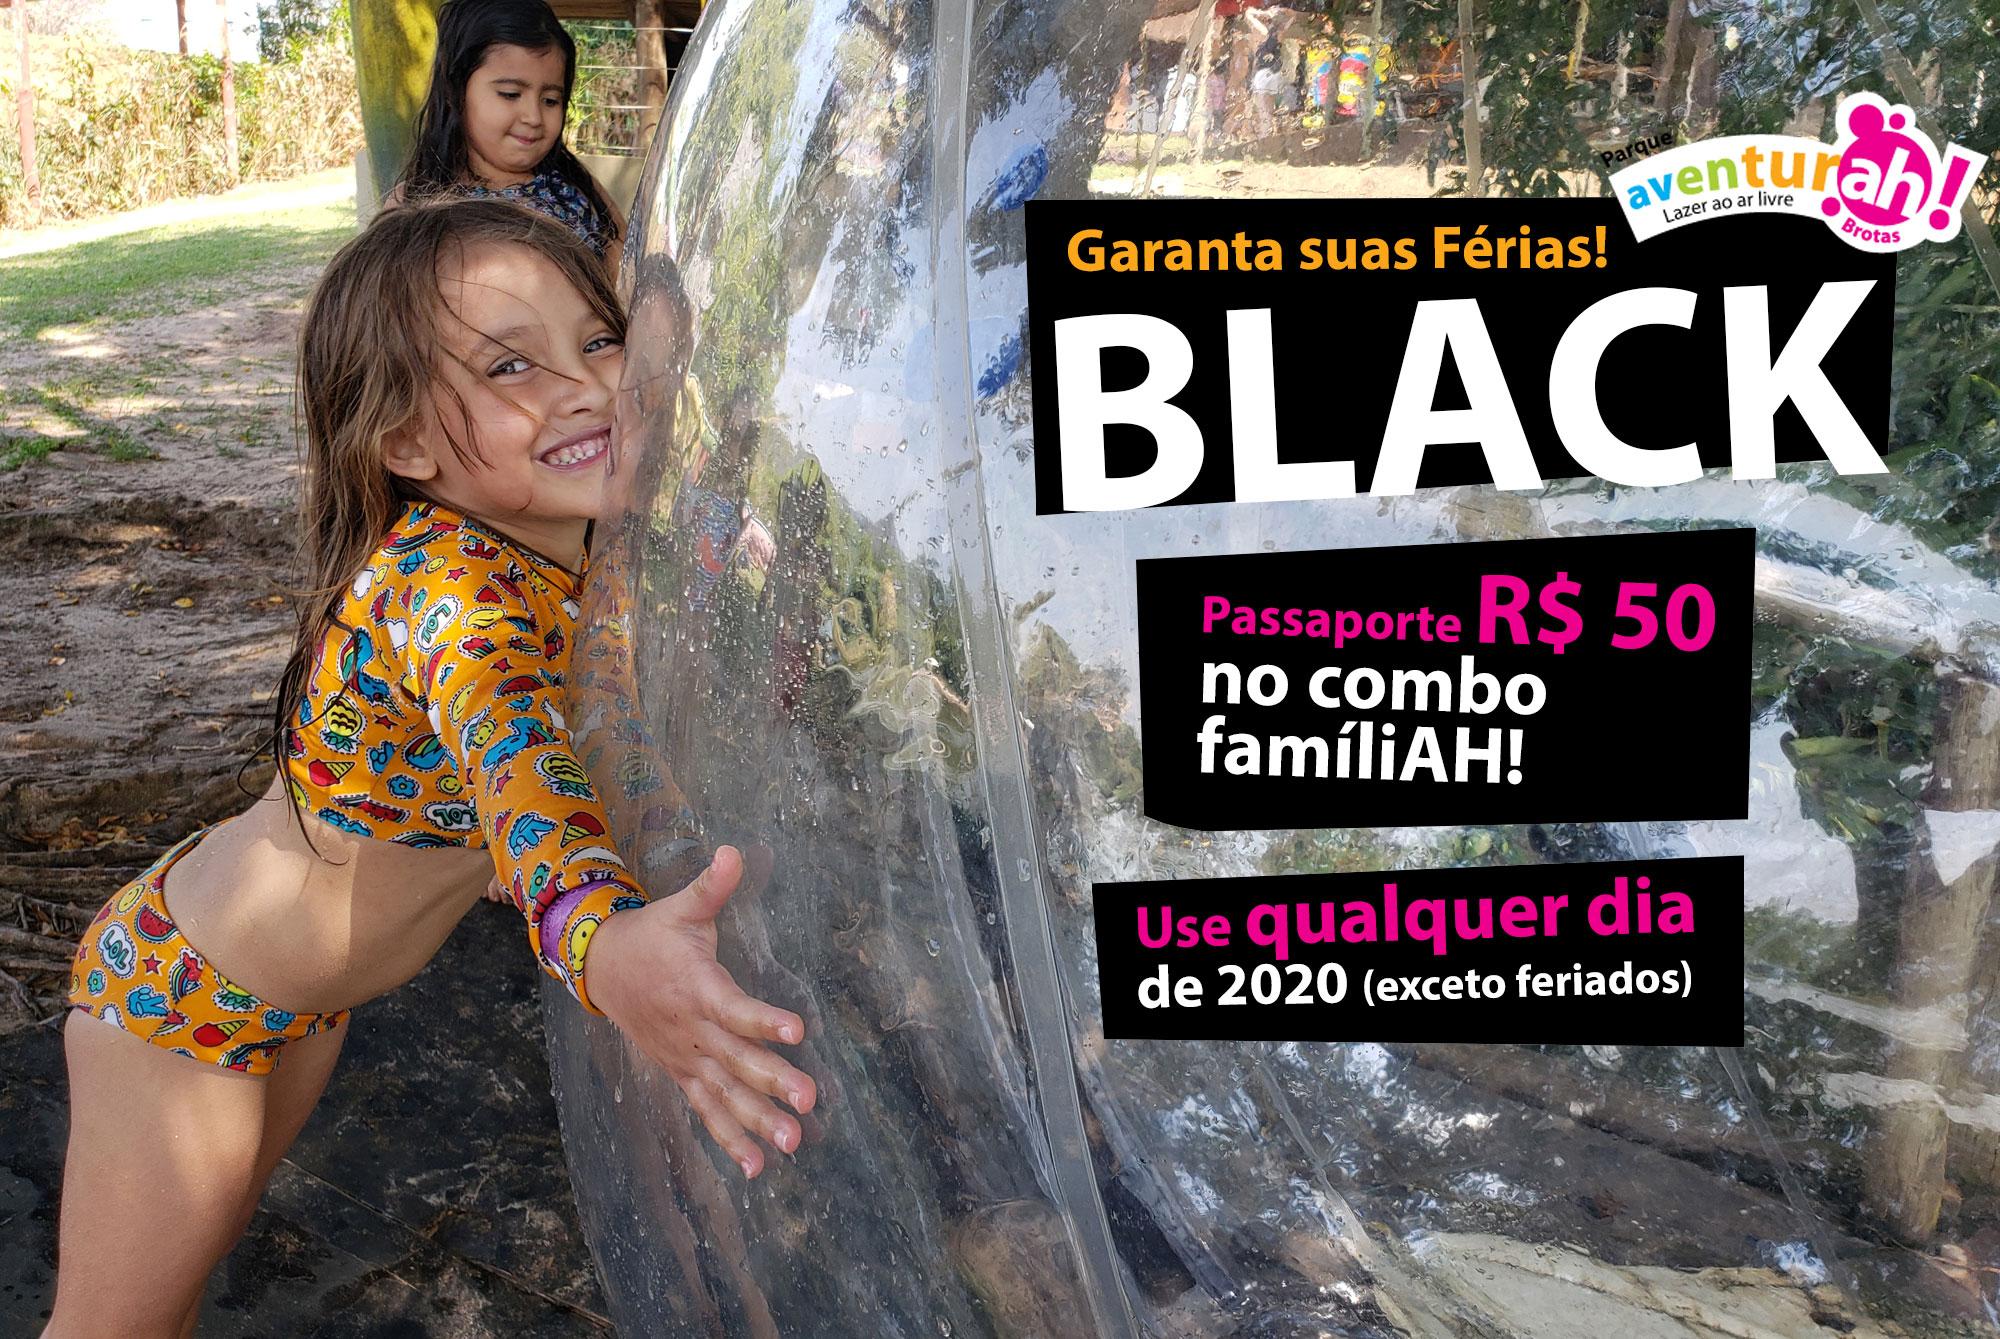 BLACK AVENTURAH